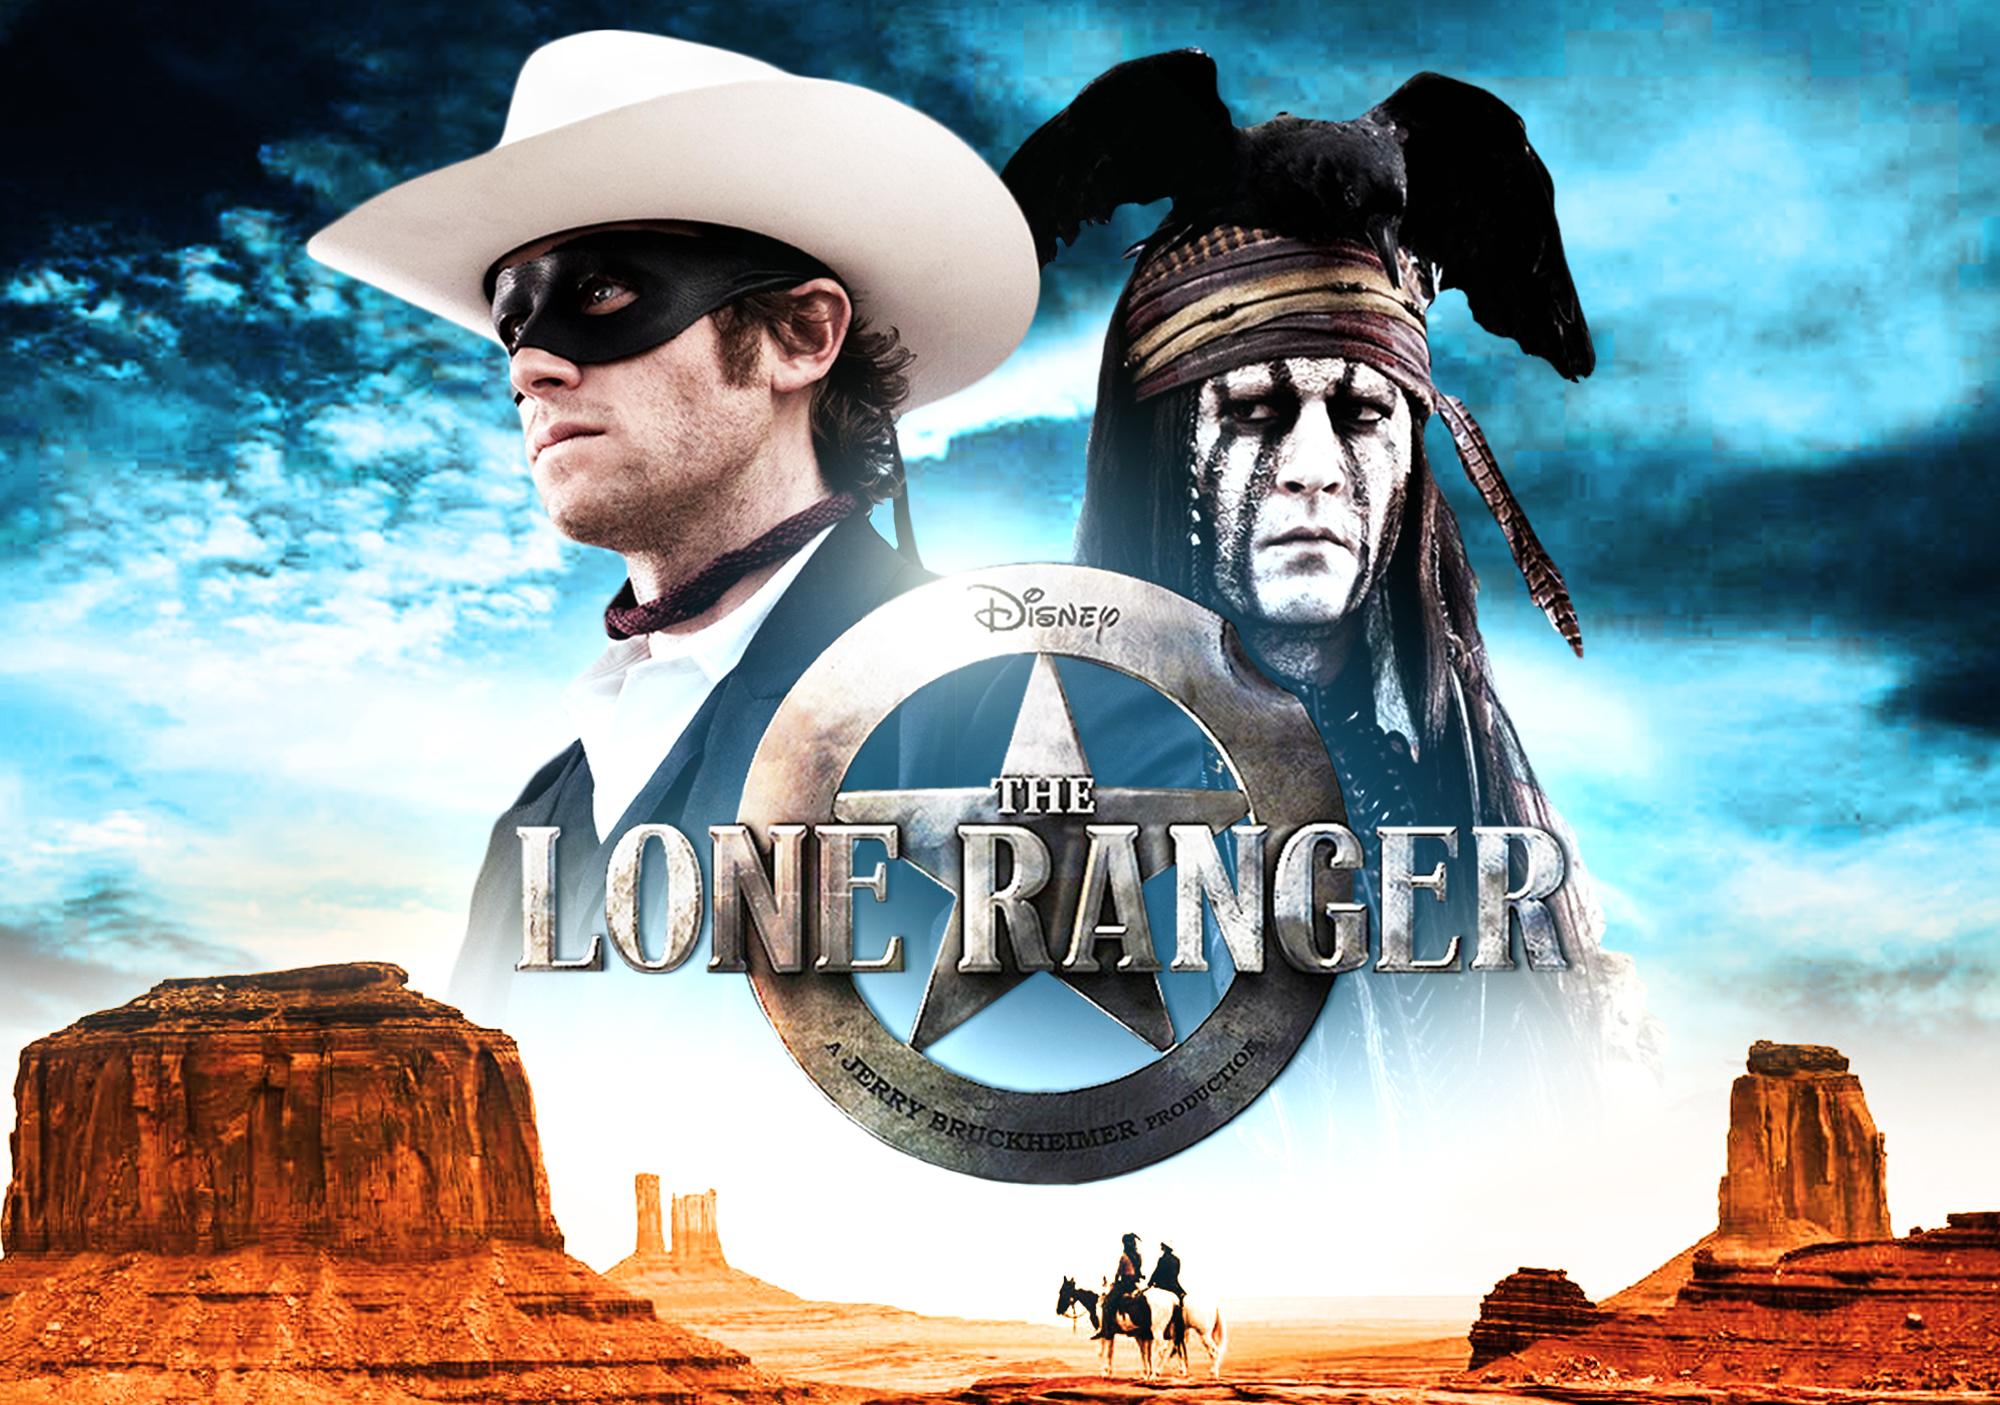 the lone ranger 2013 the lone ranger fan art 32352271